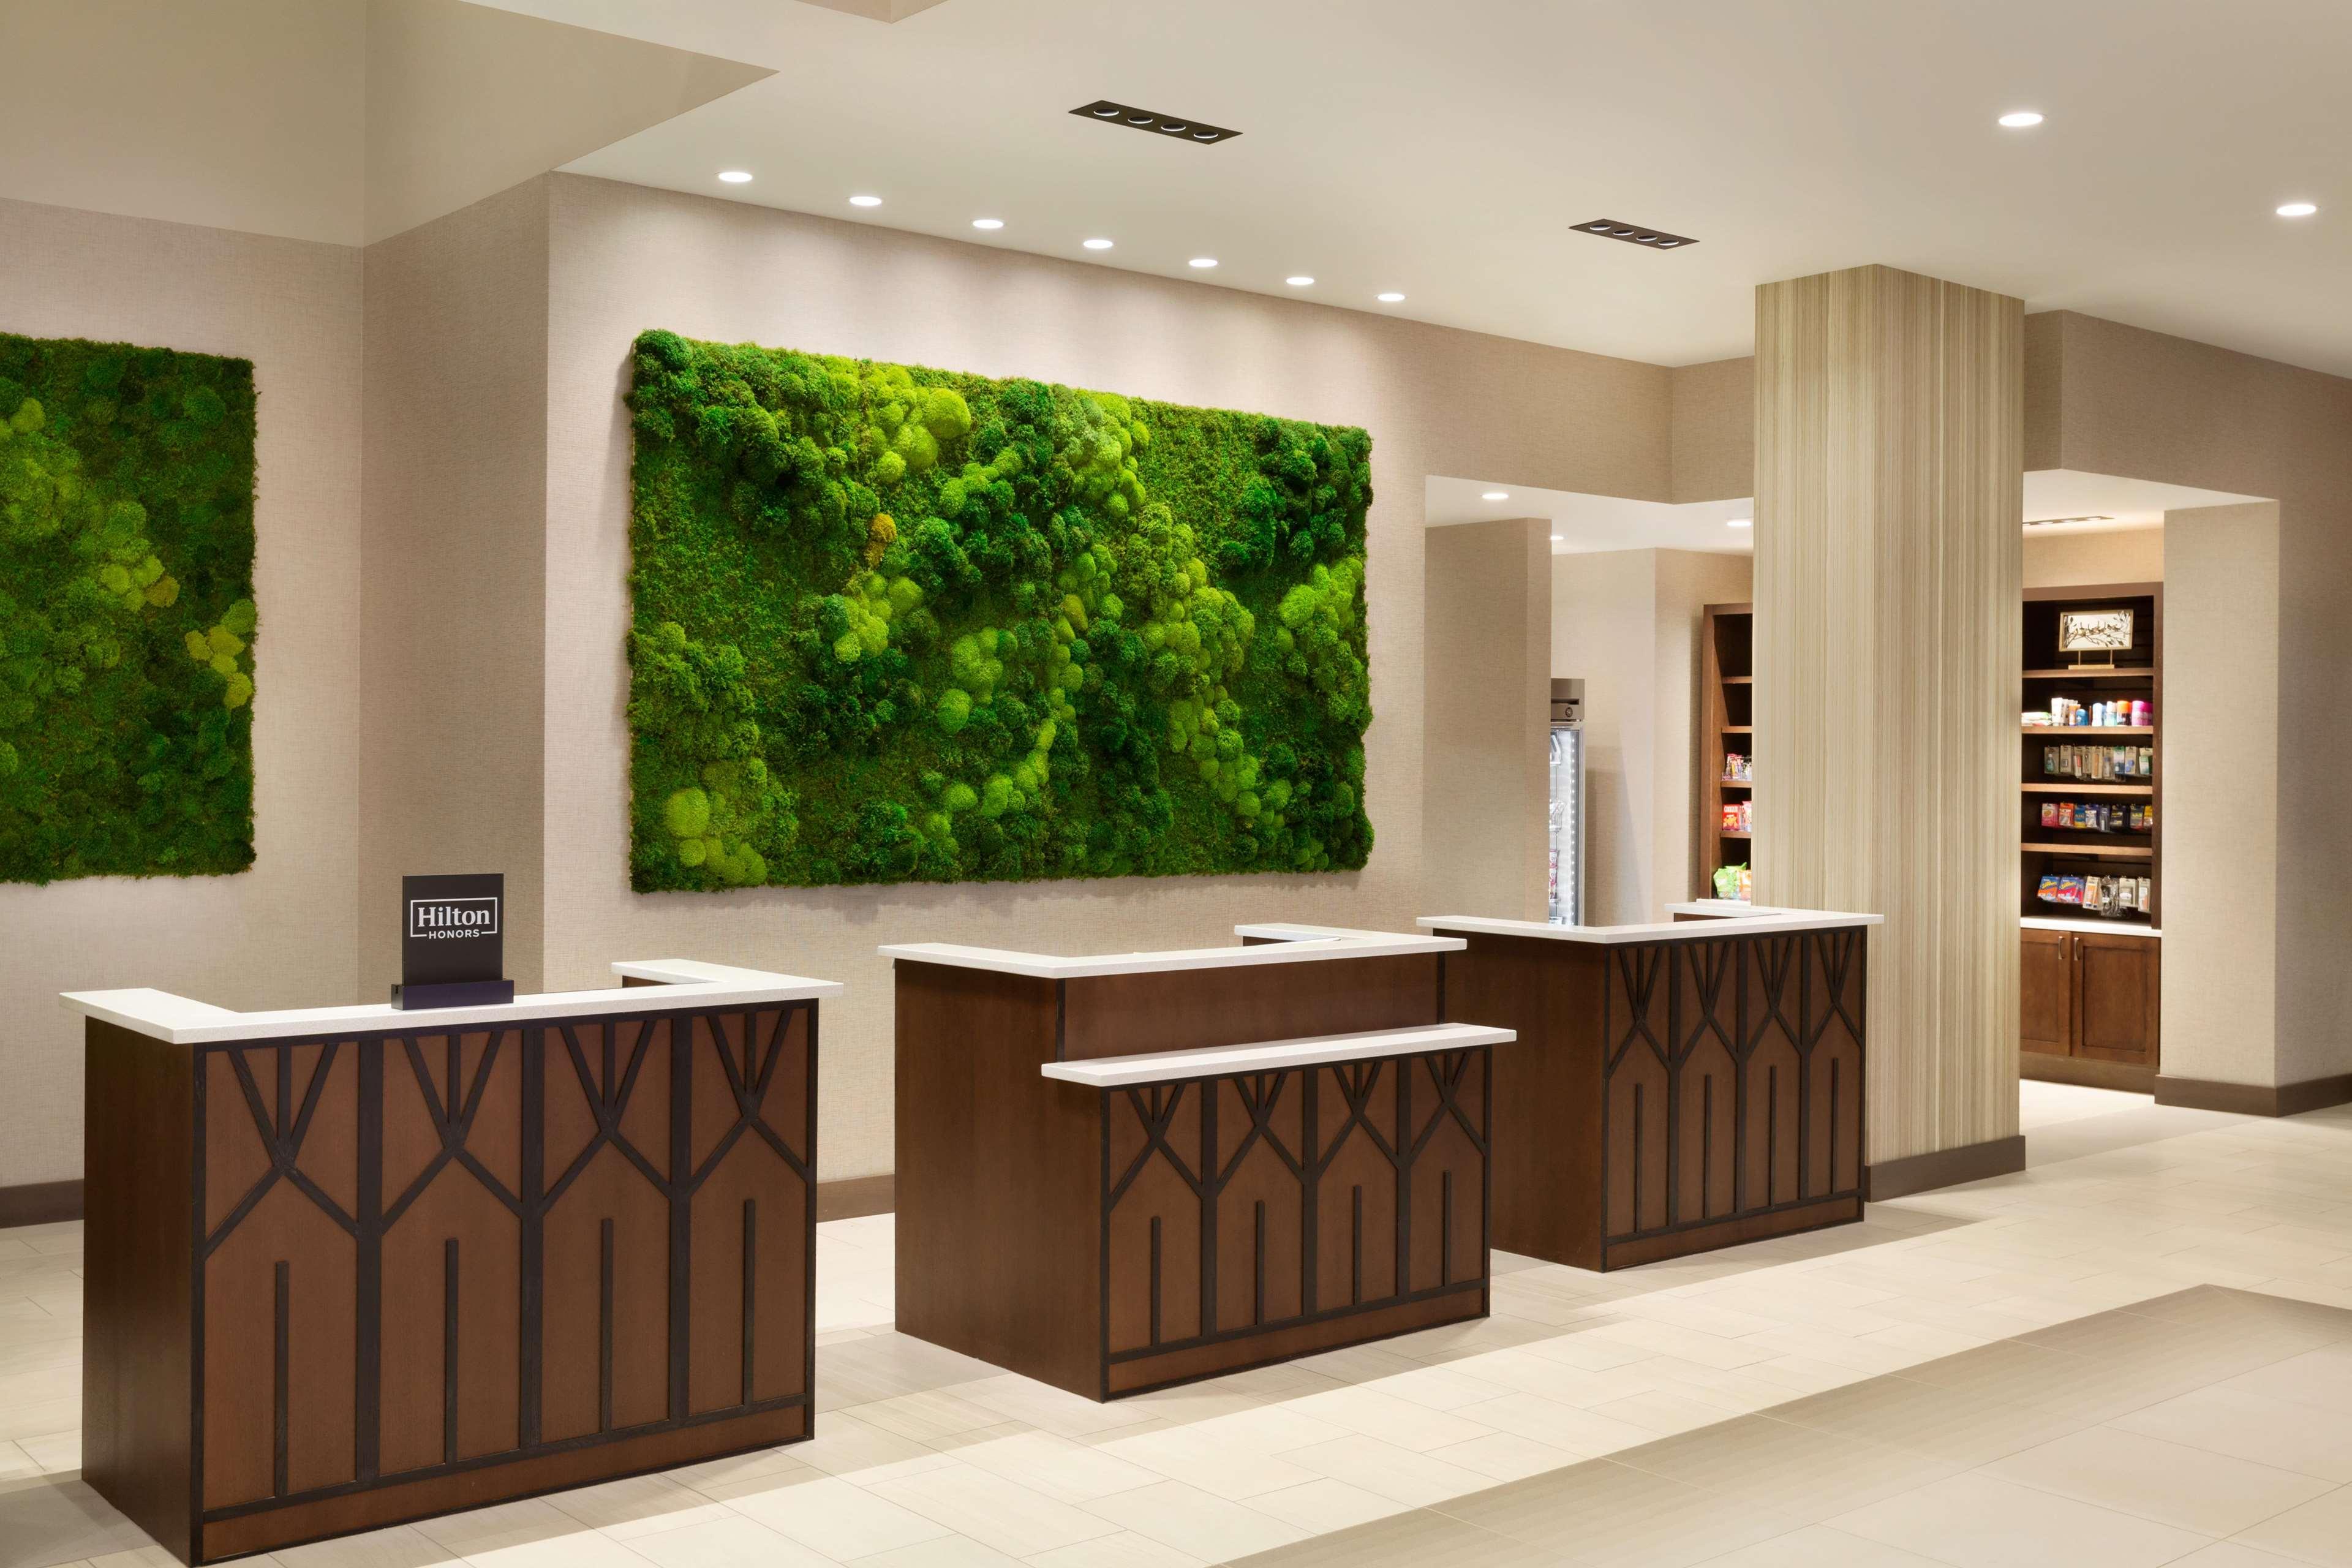 Embassy Suites by Hilton Oahu Kapolei image 10